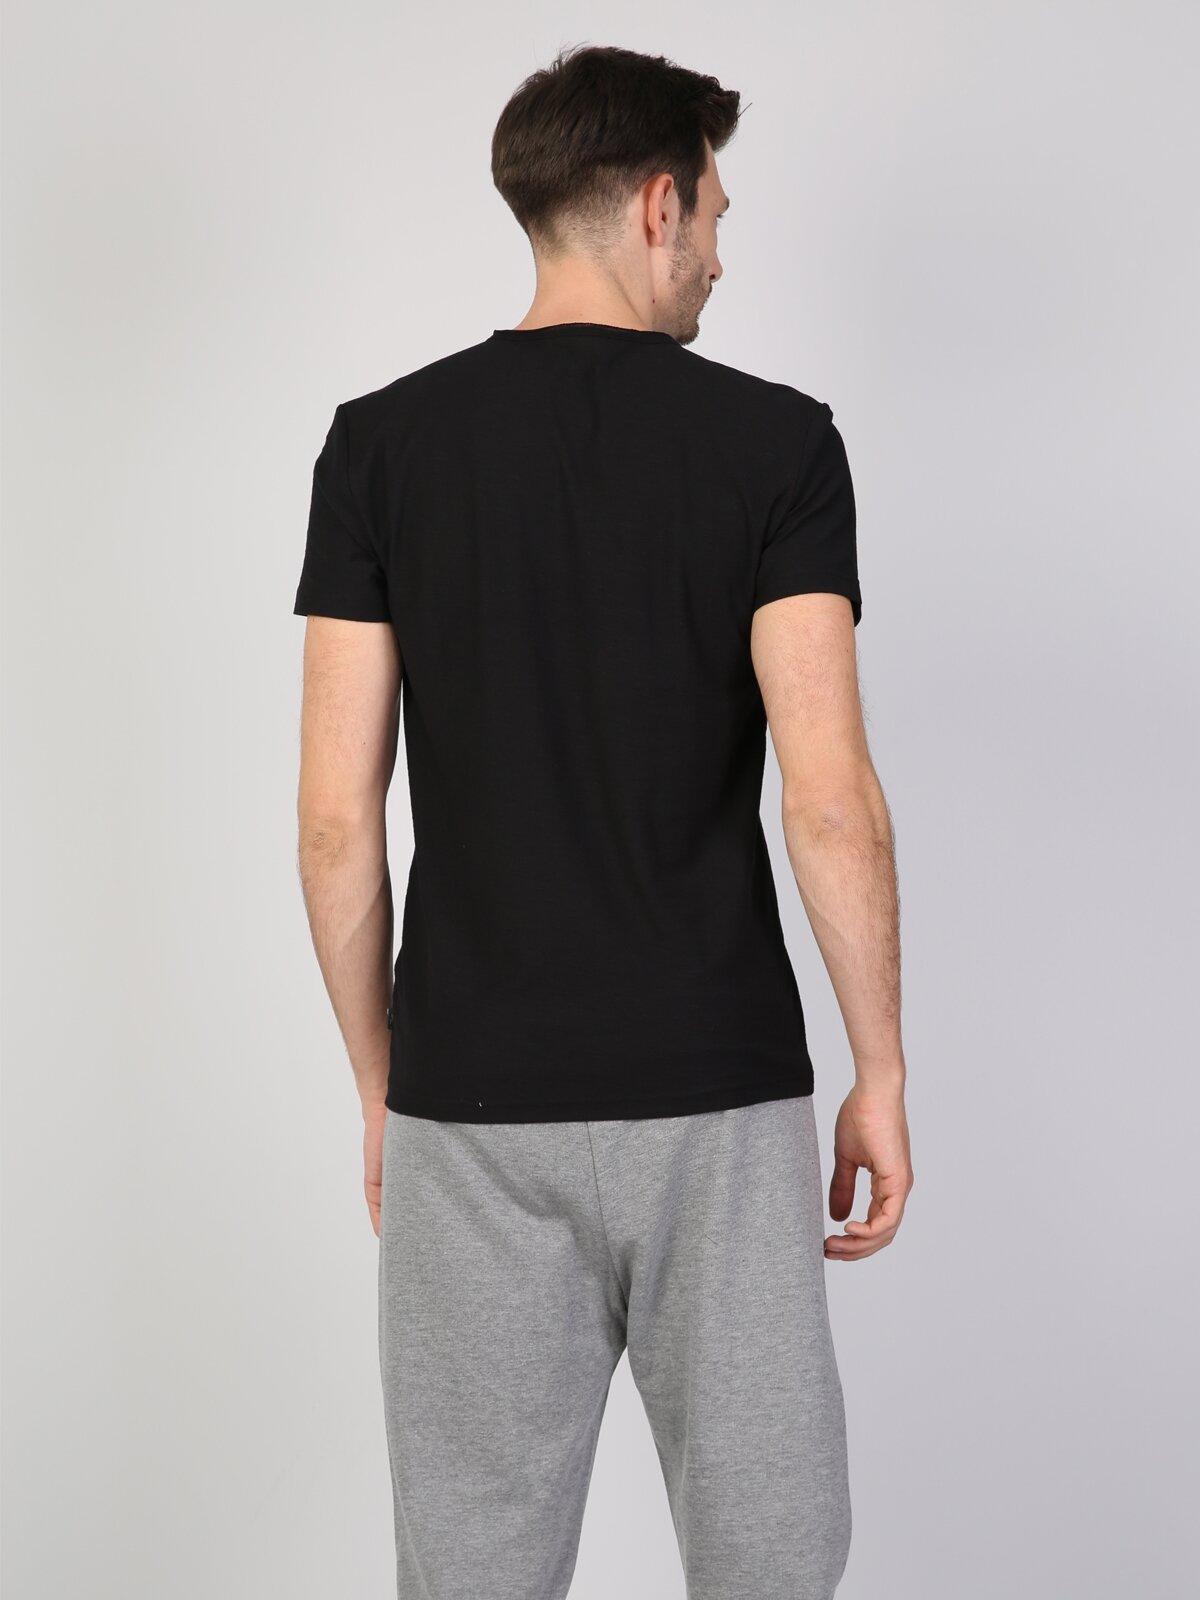 Siyah V Yaka Erkek Kısa Kol Tişört